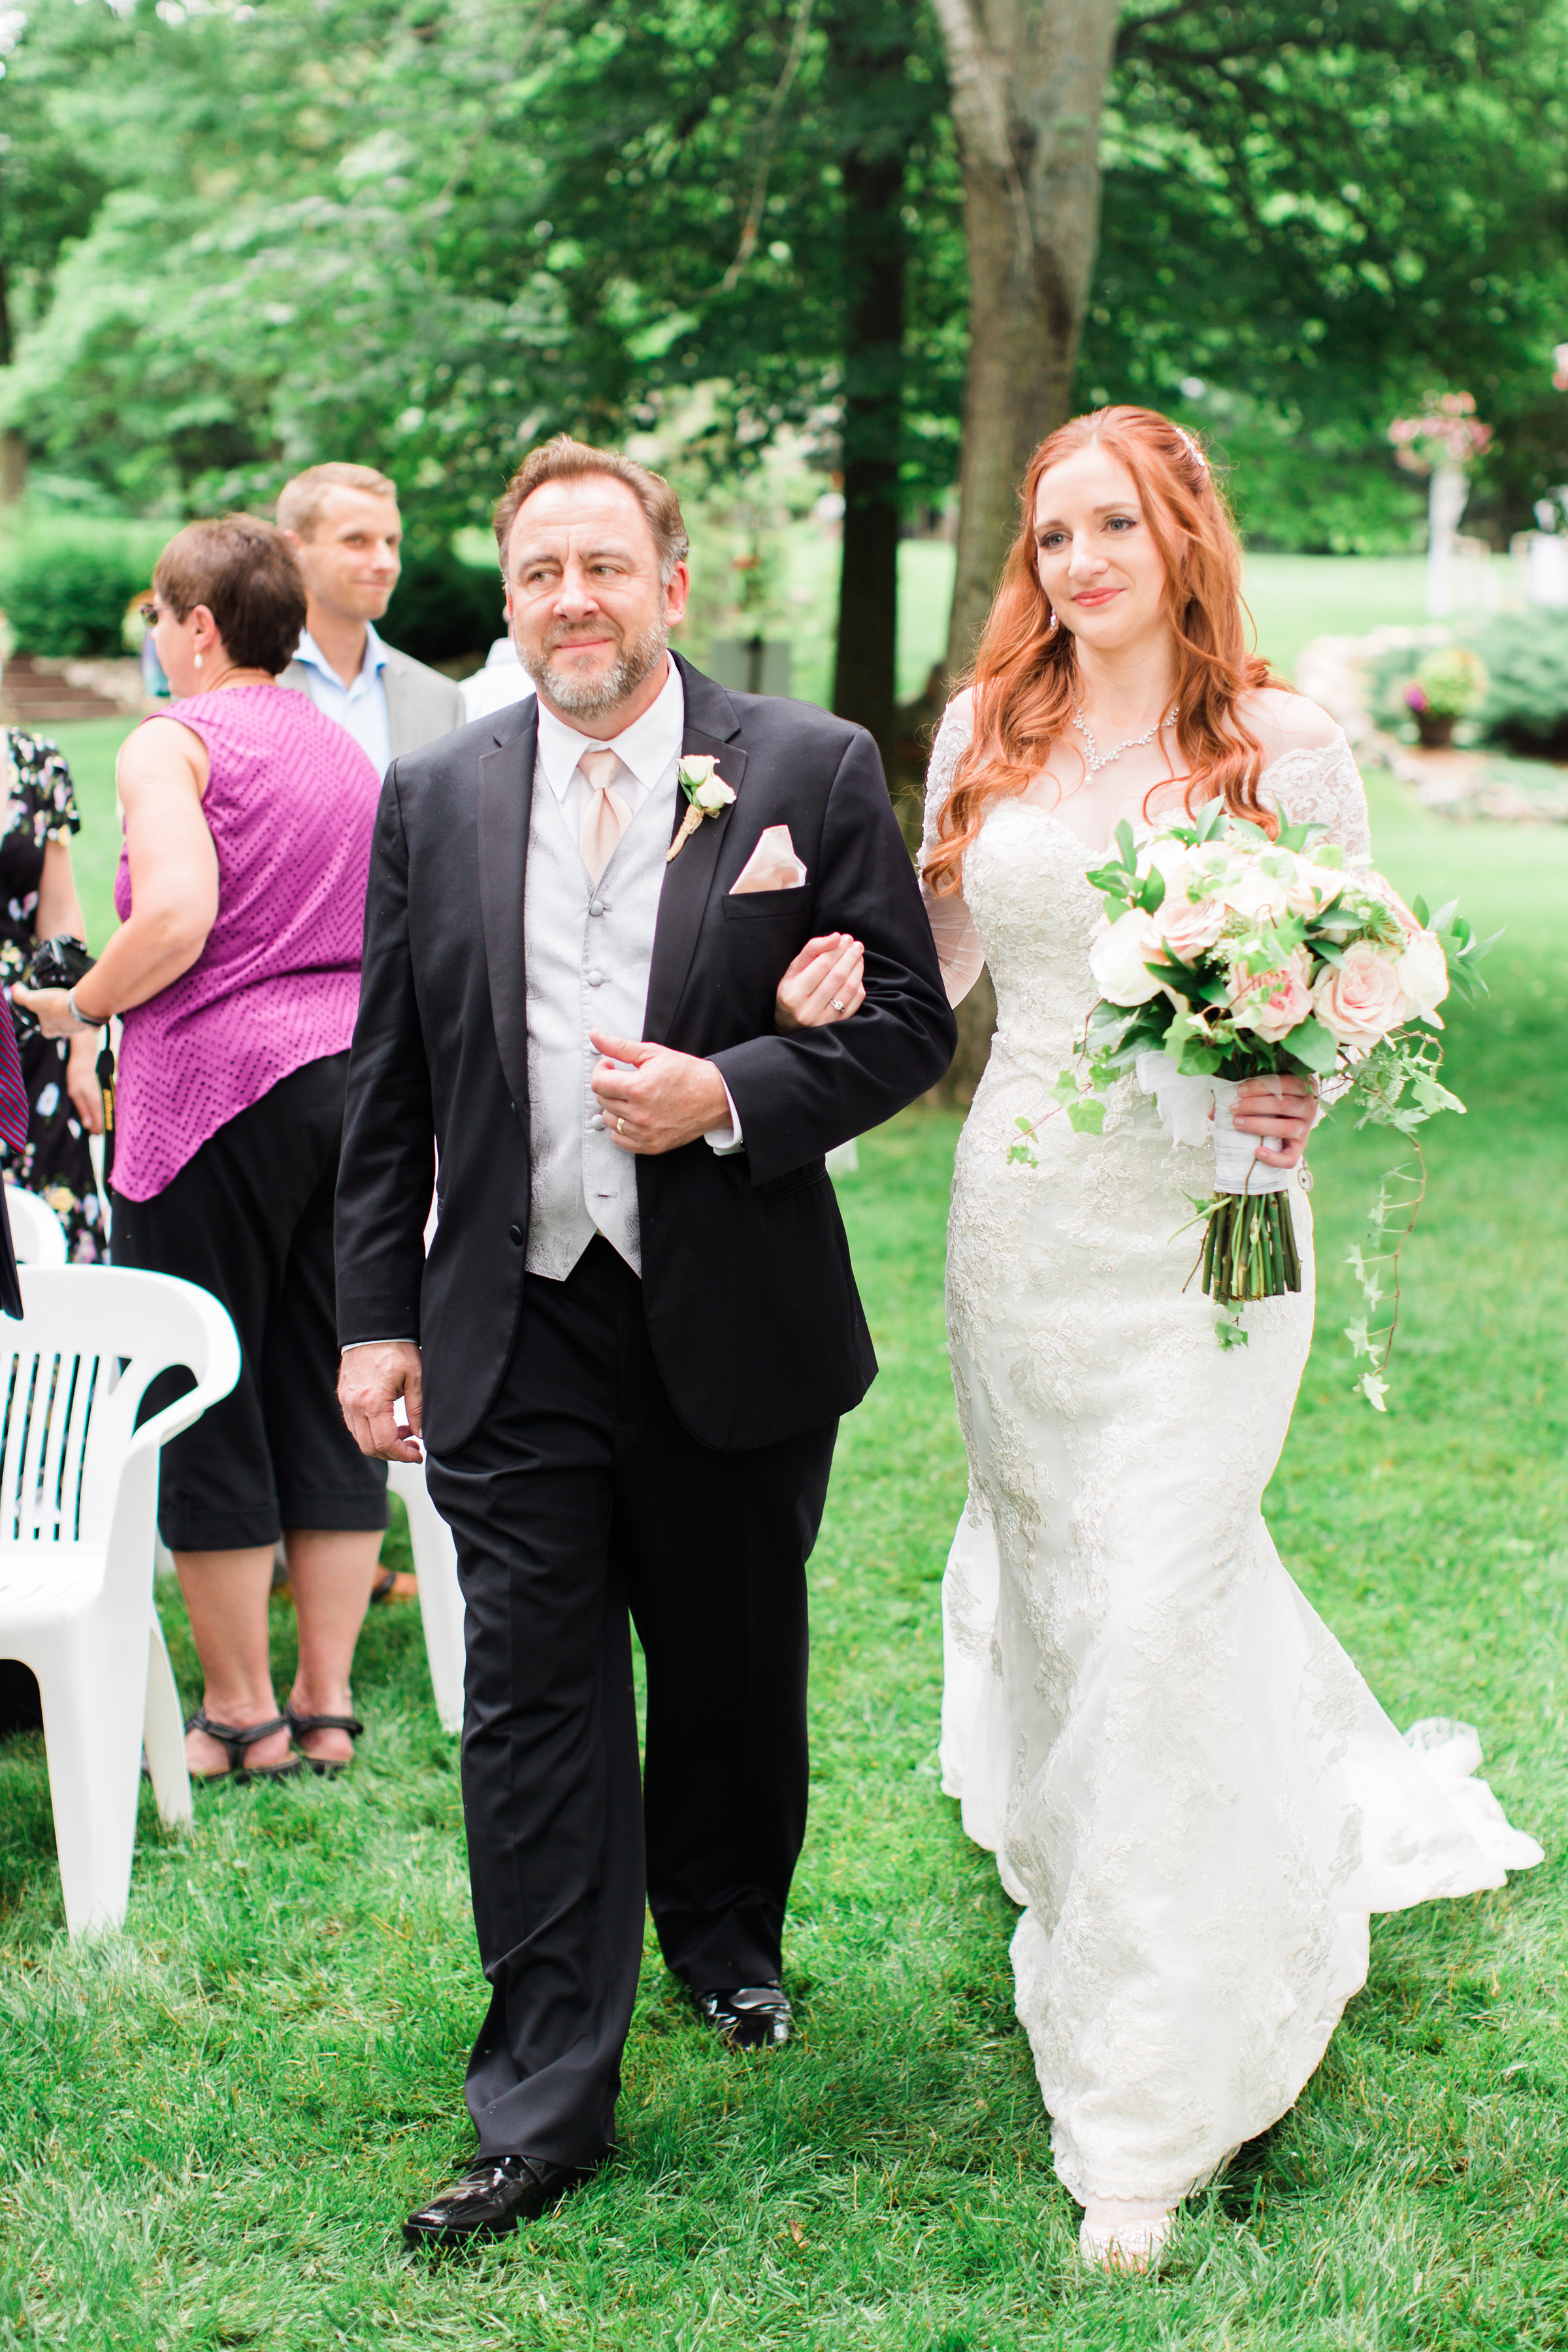 Conger+Wedding+Ceremony-44.jpg